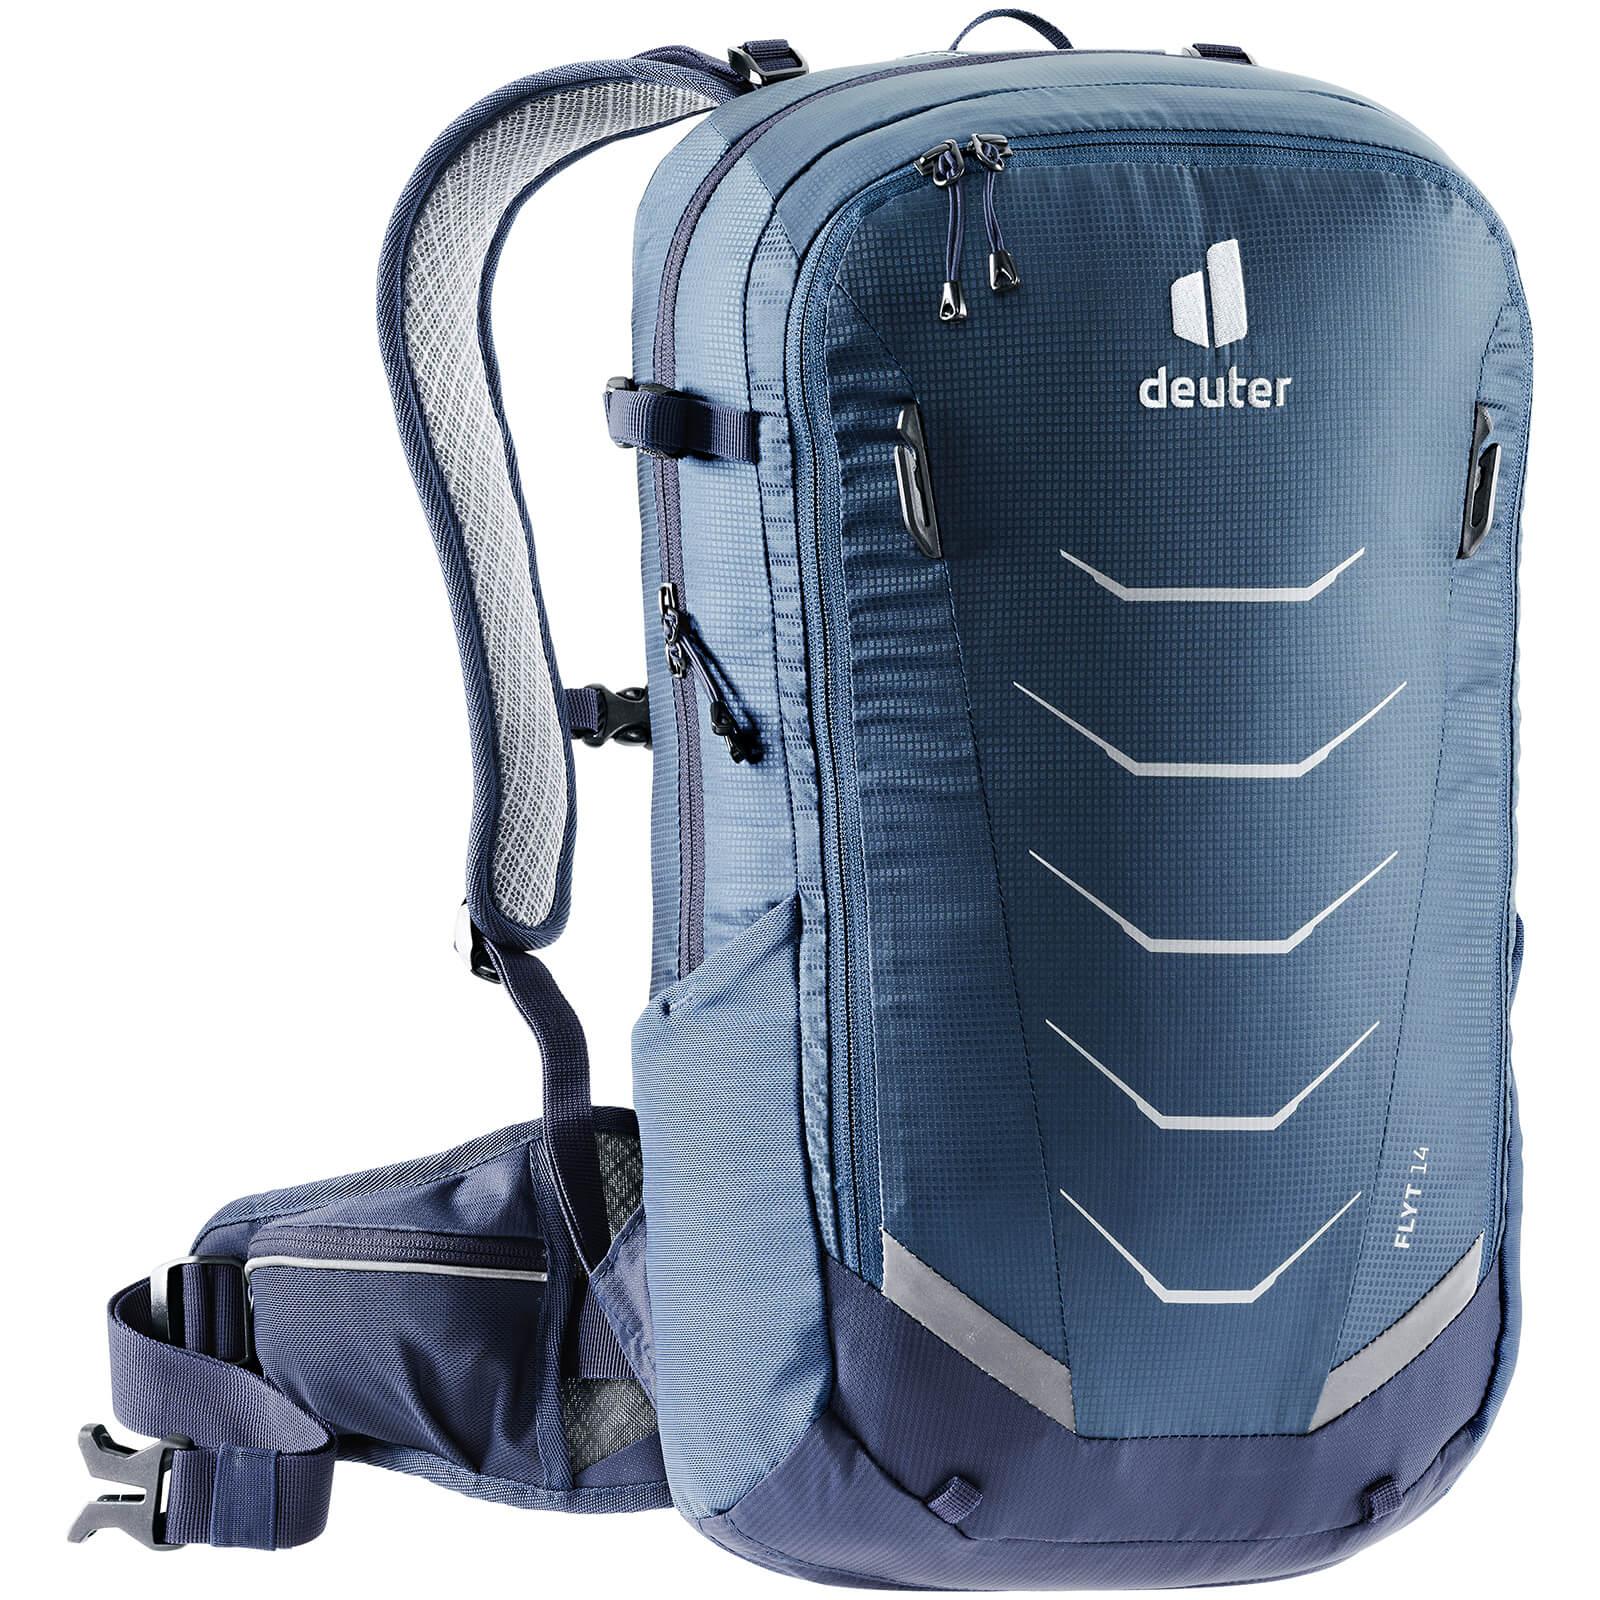 deuter Flyt 14 Backpack - Marine-Navy